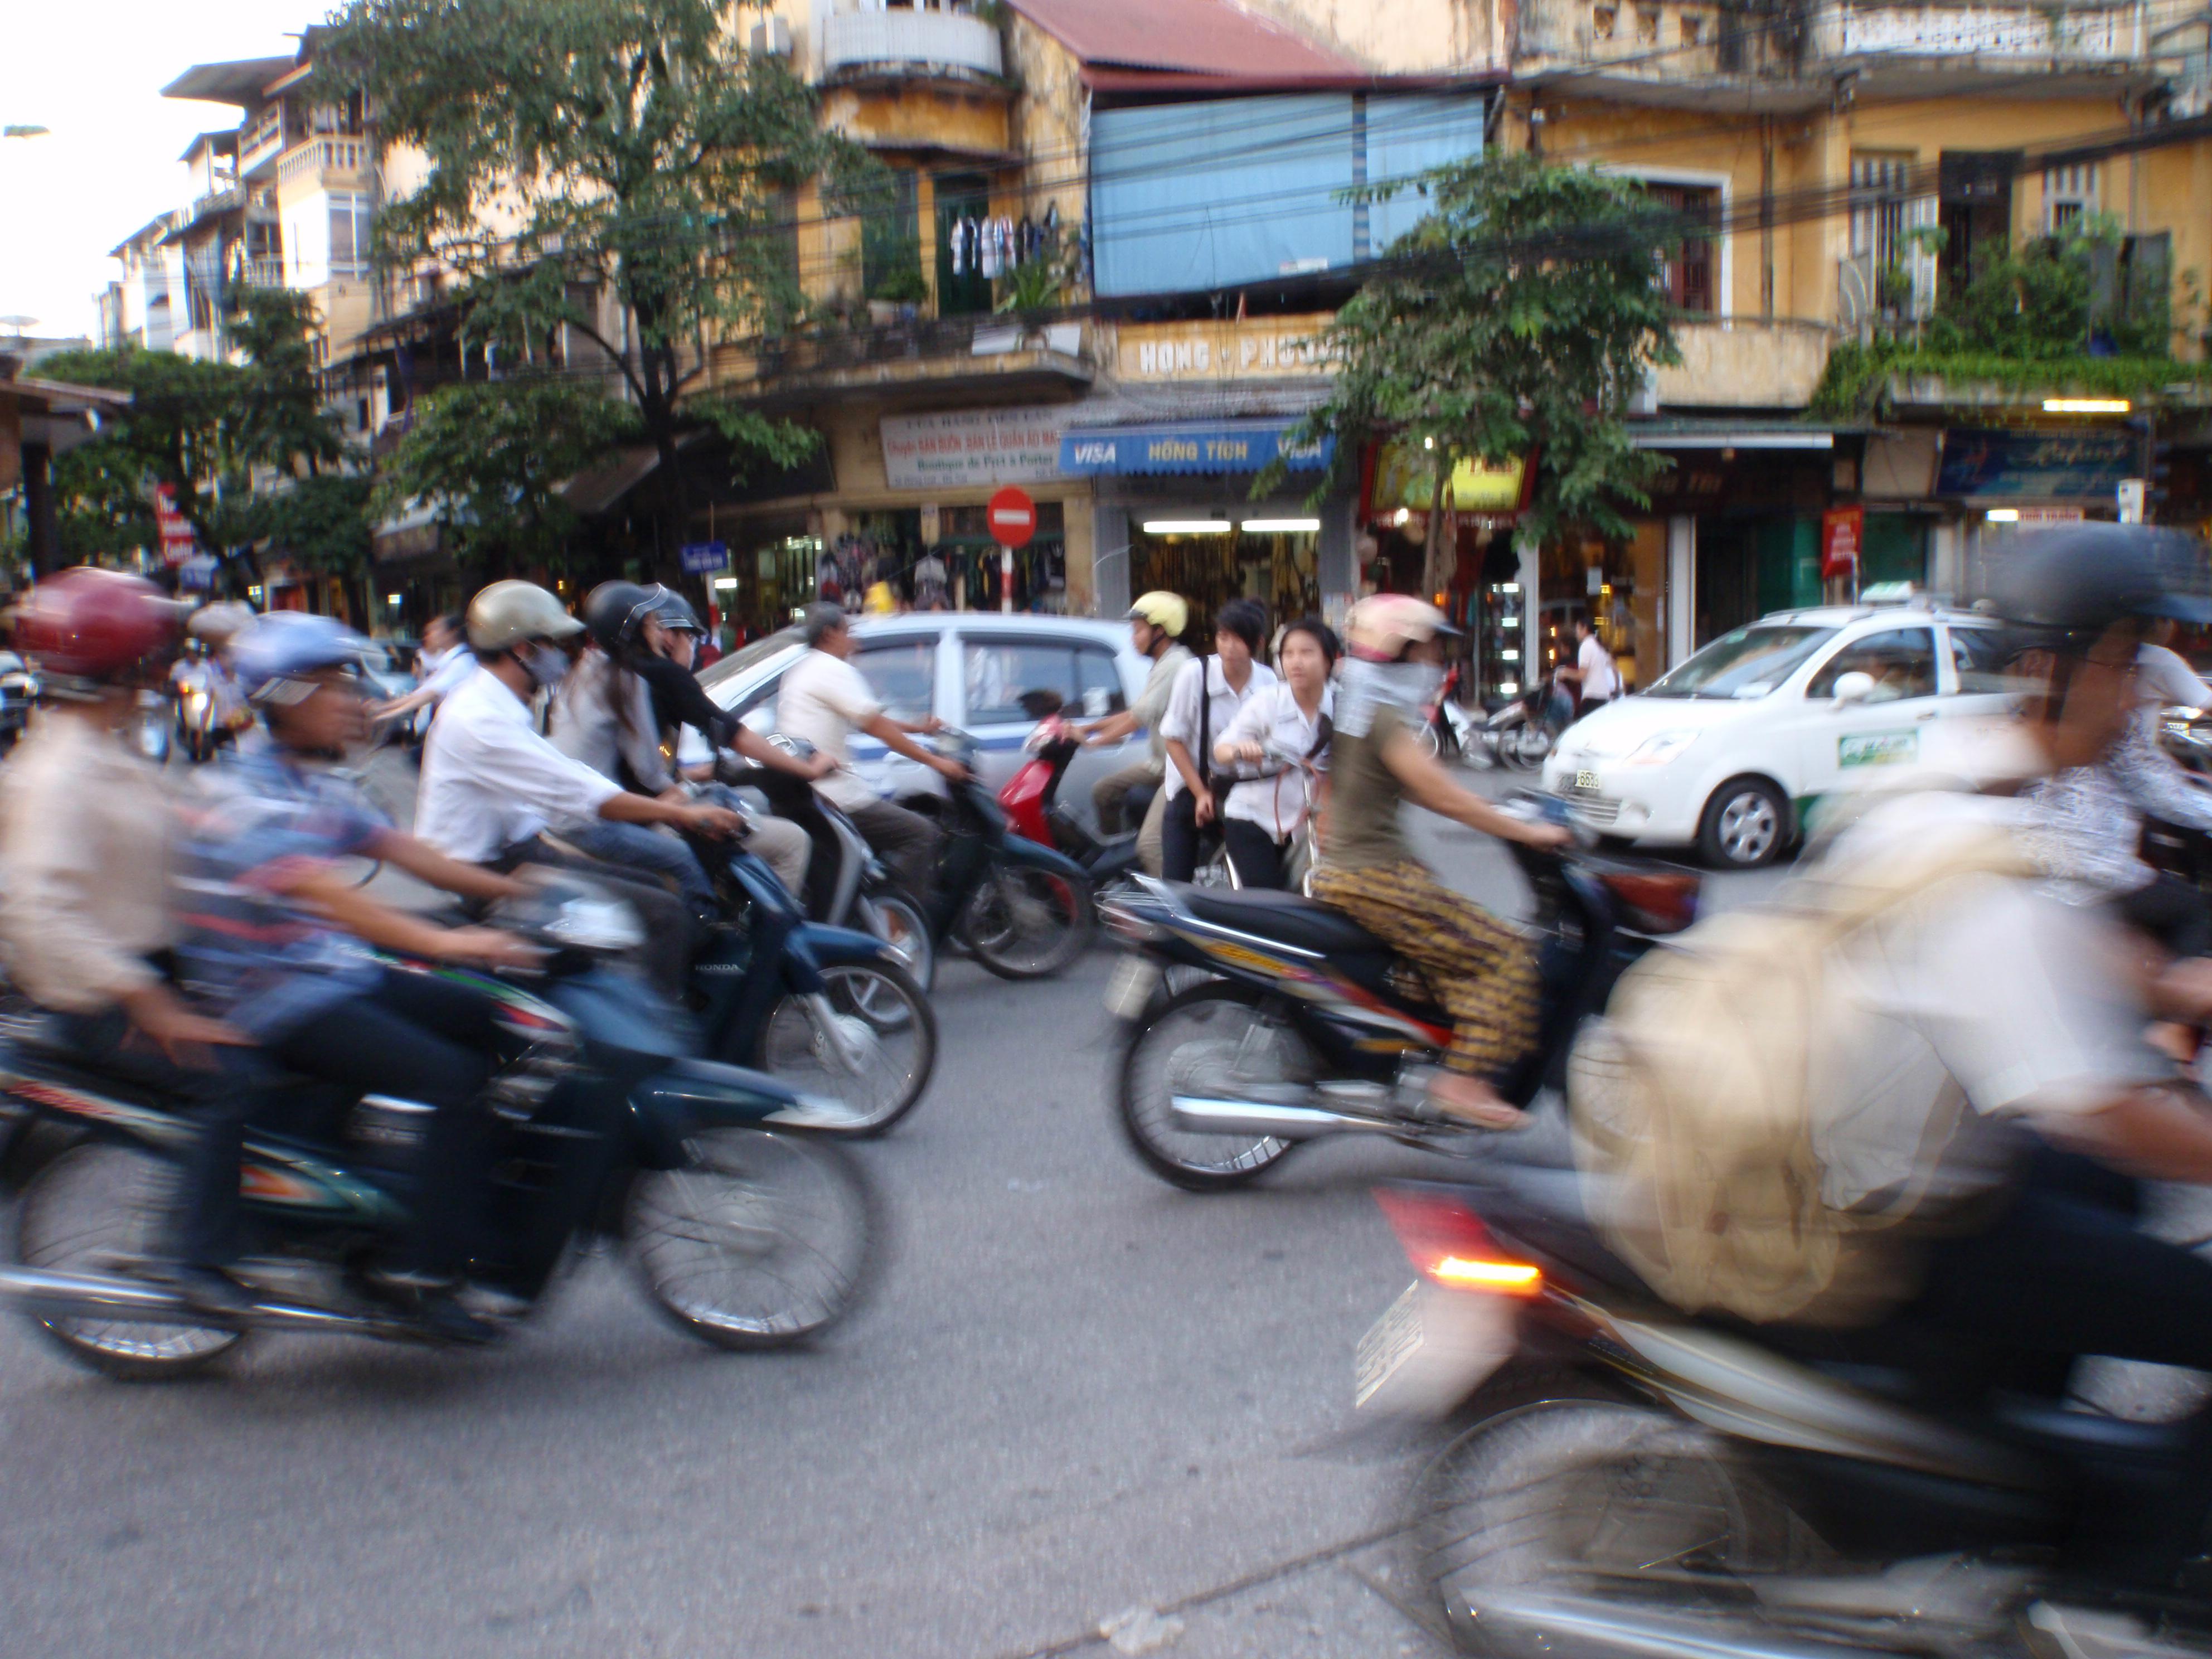 Hanoi traffic and how to cross